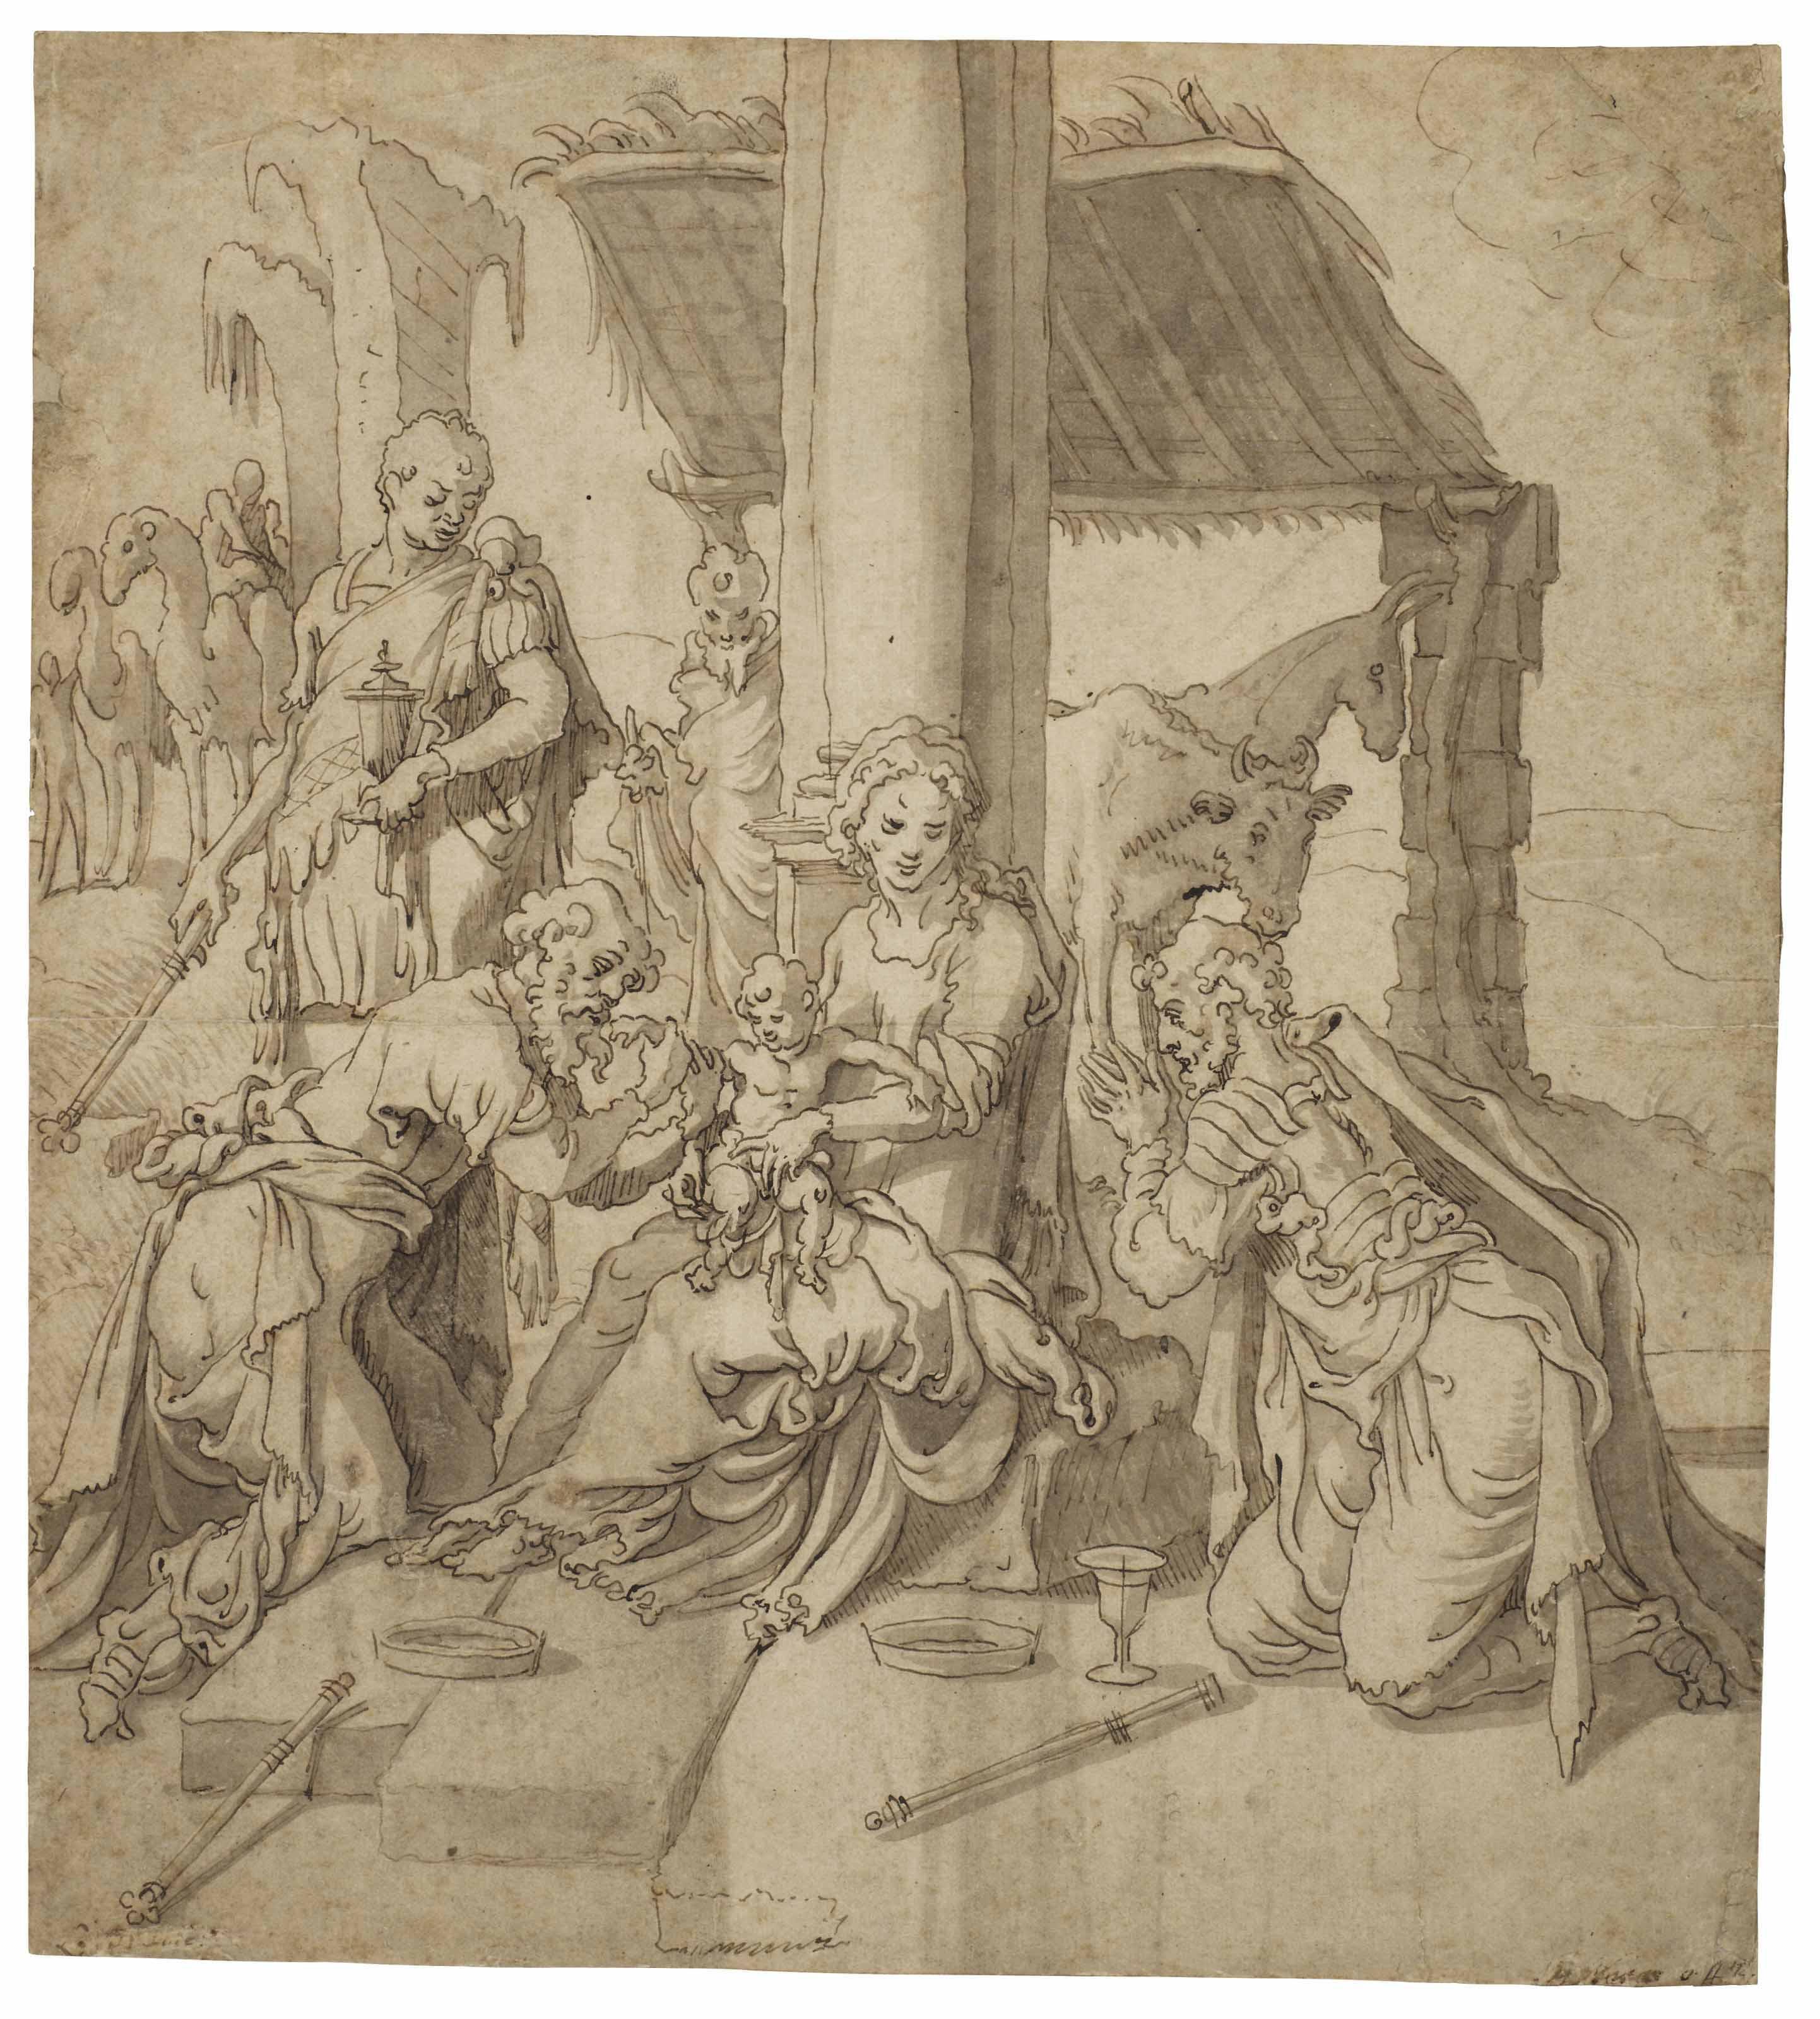 Pieter Aertsen (Amsterdam 1508